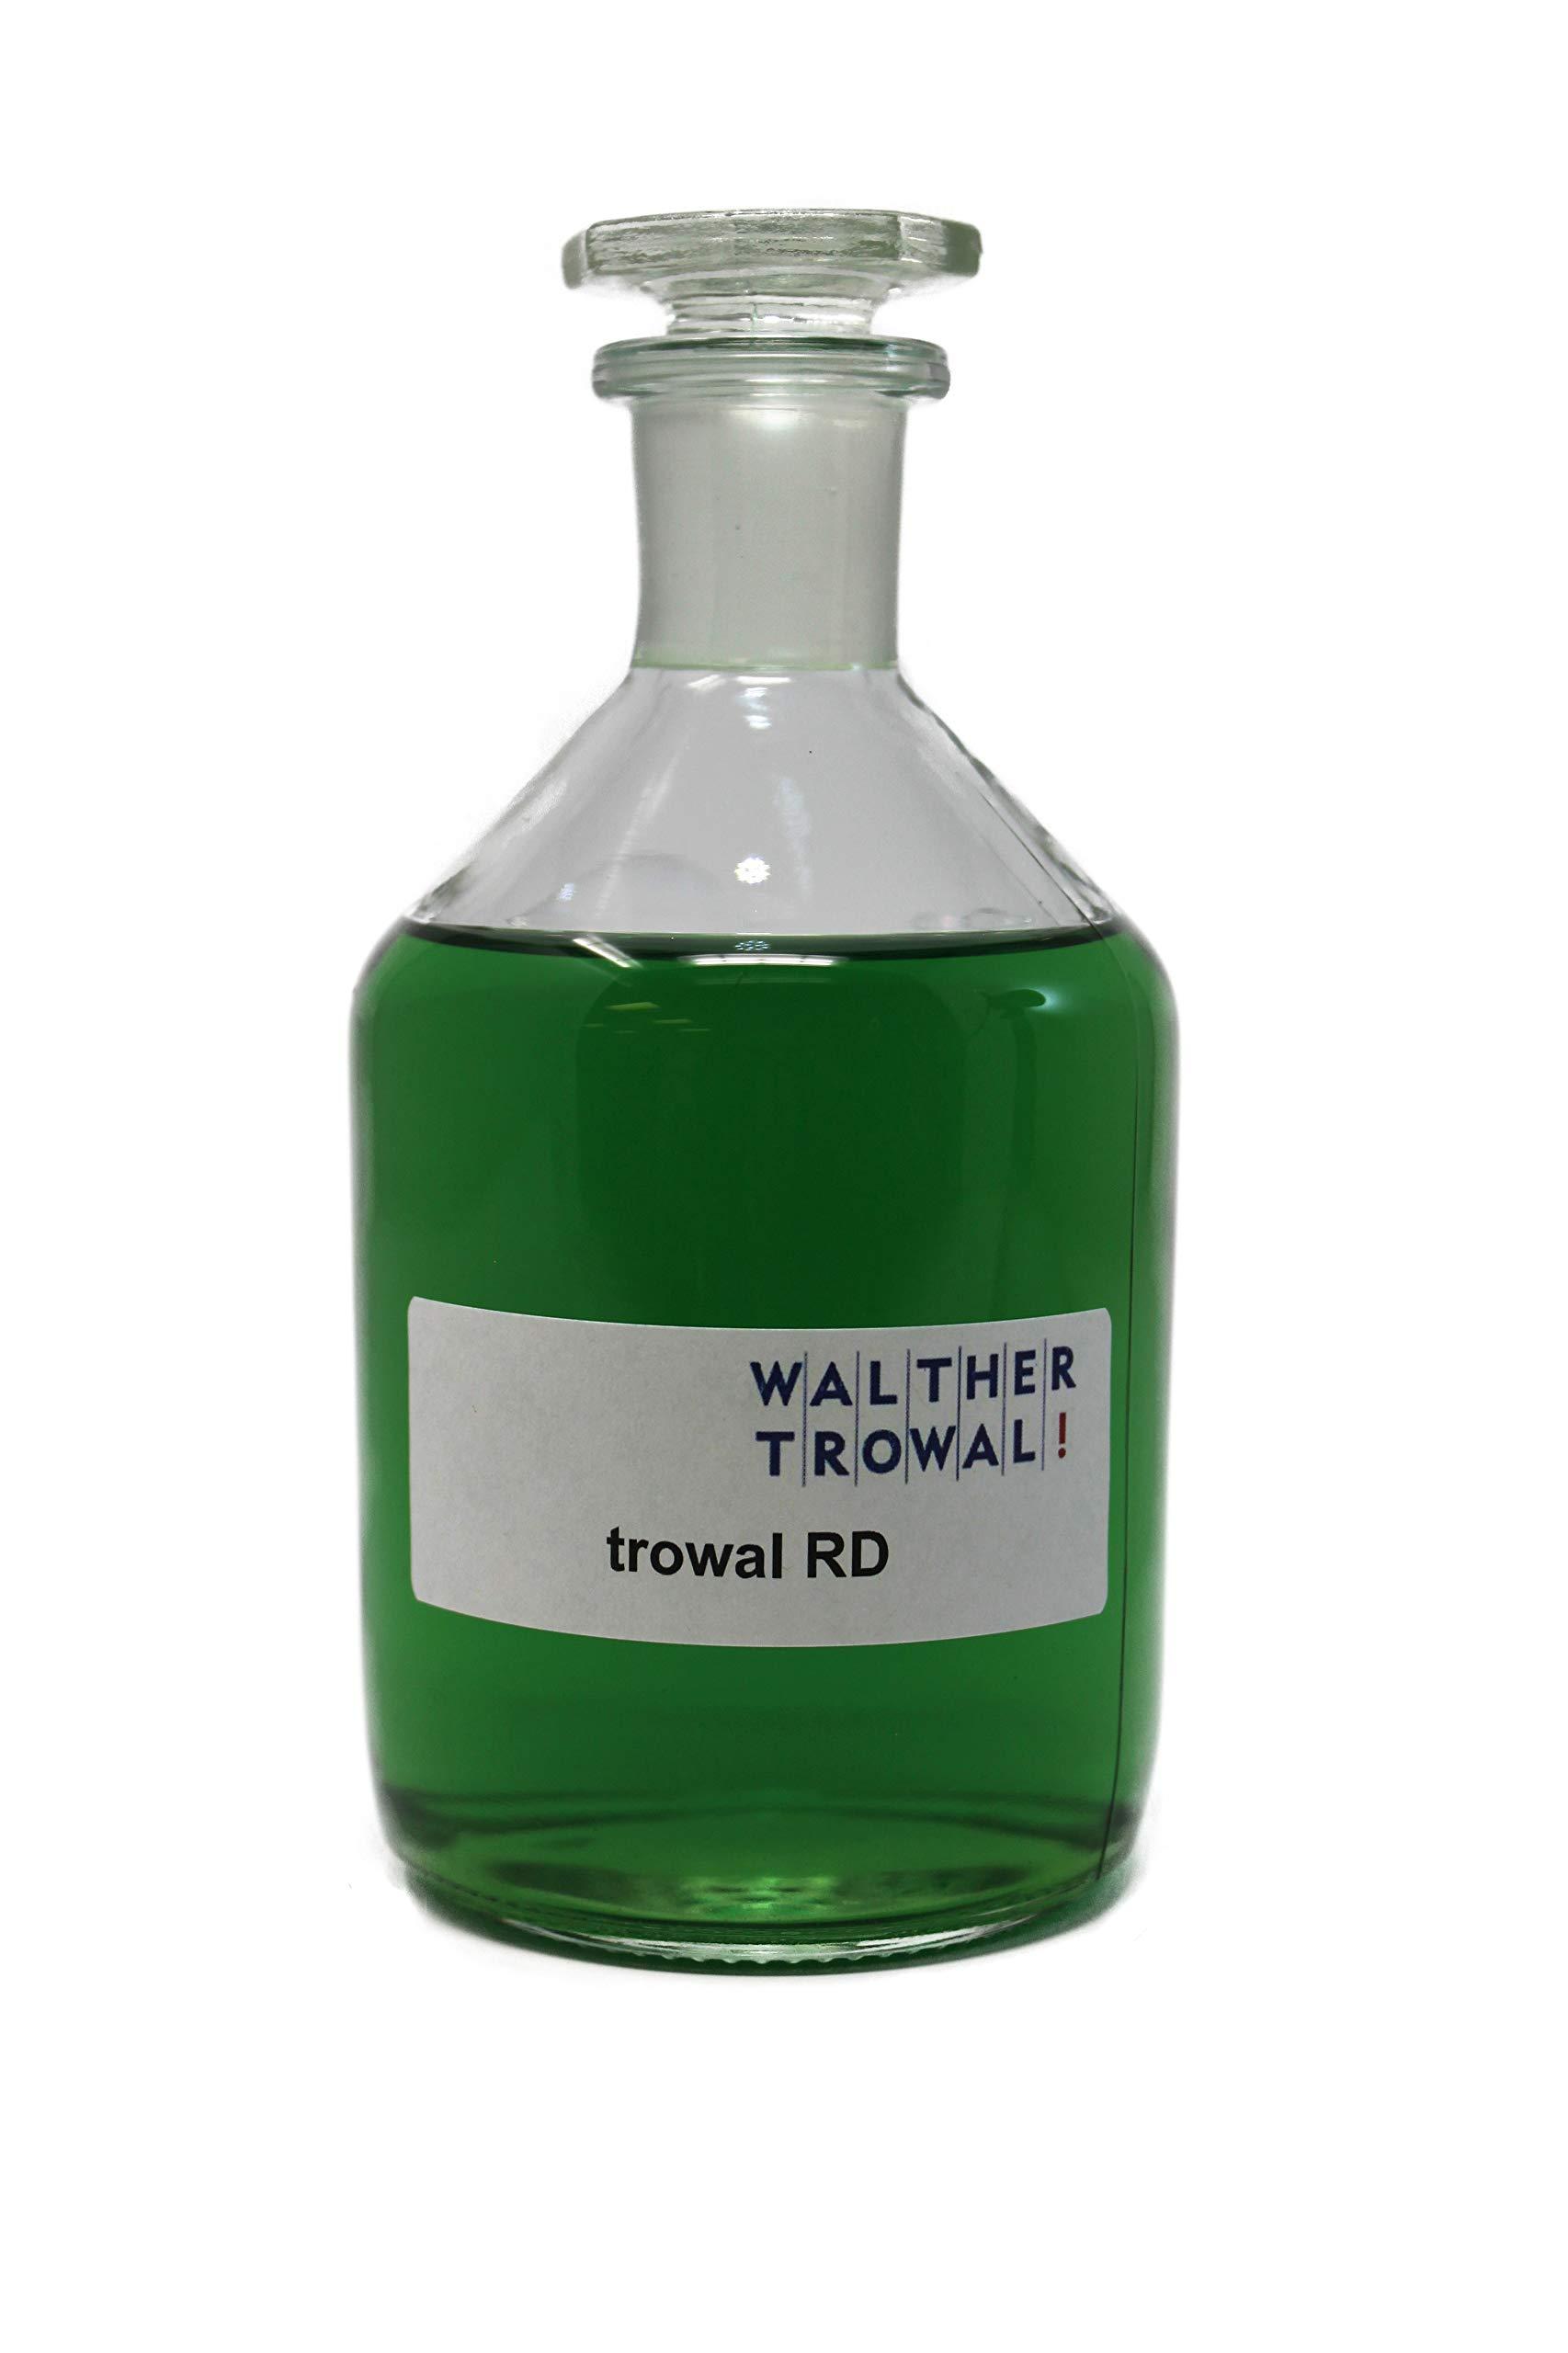 Walther Trowal RD, Acidic Burnishing Liquid Compound, 18 KG Bucket